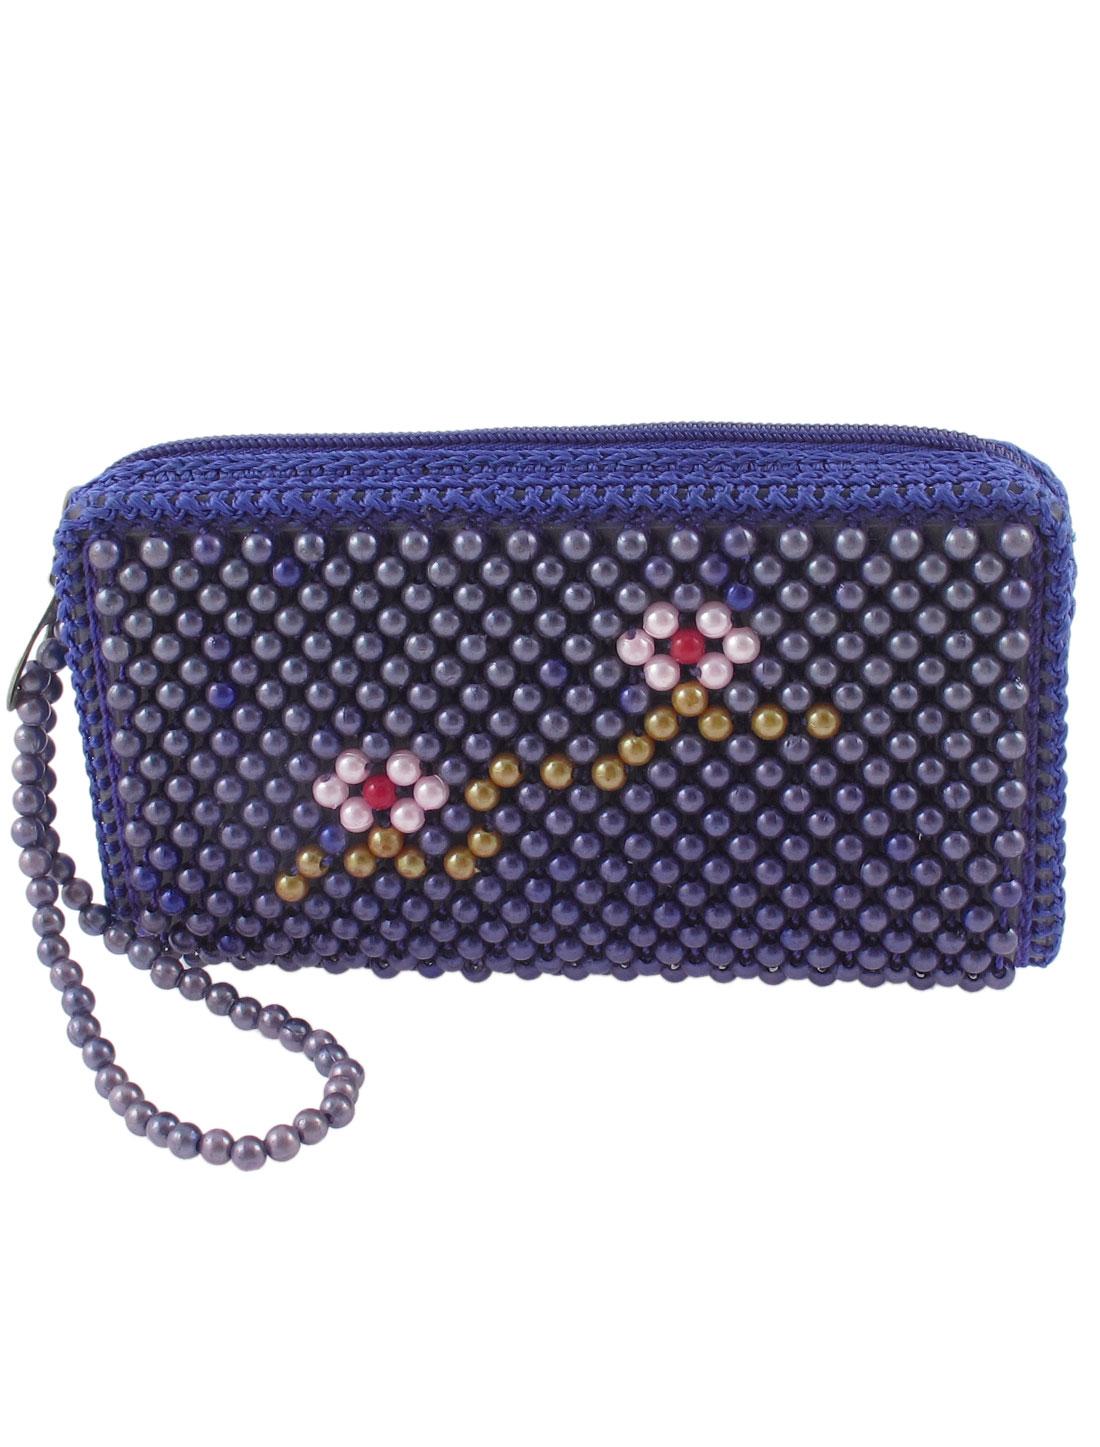 Woman Zipper Closure Rectangle Bead Sewing Purse Handbag Dark Blue